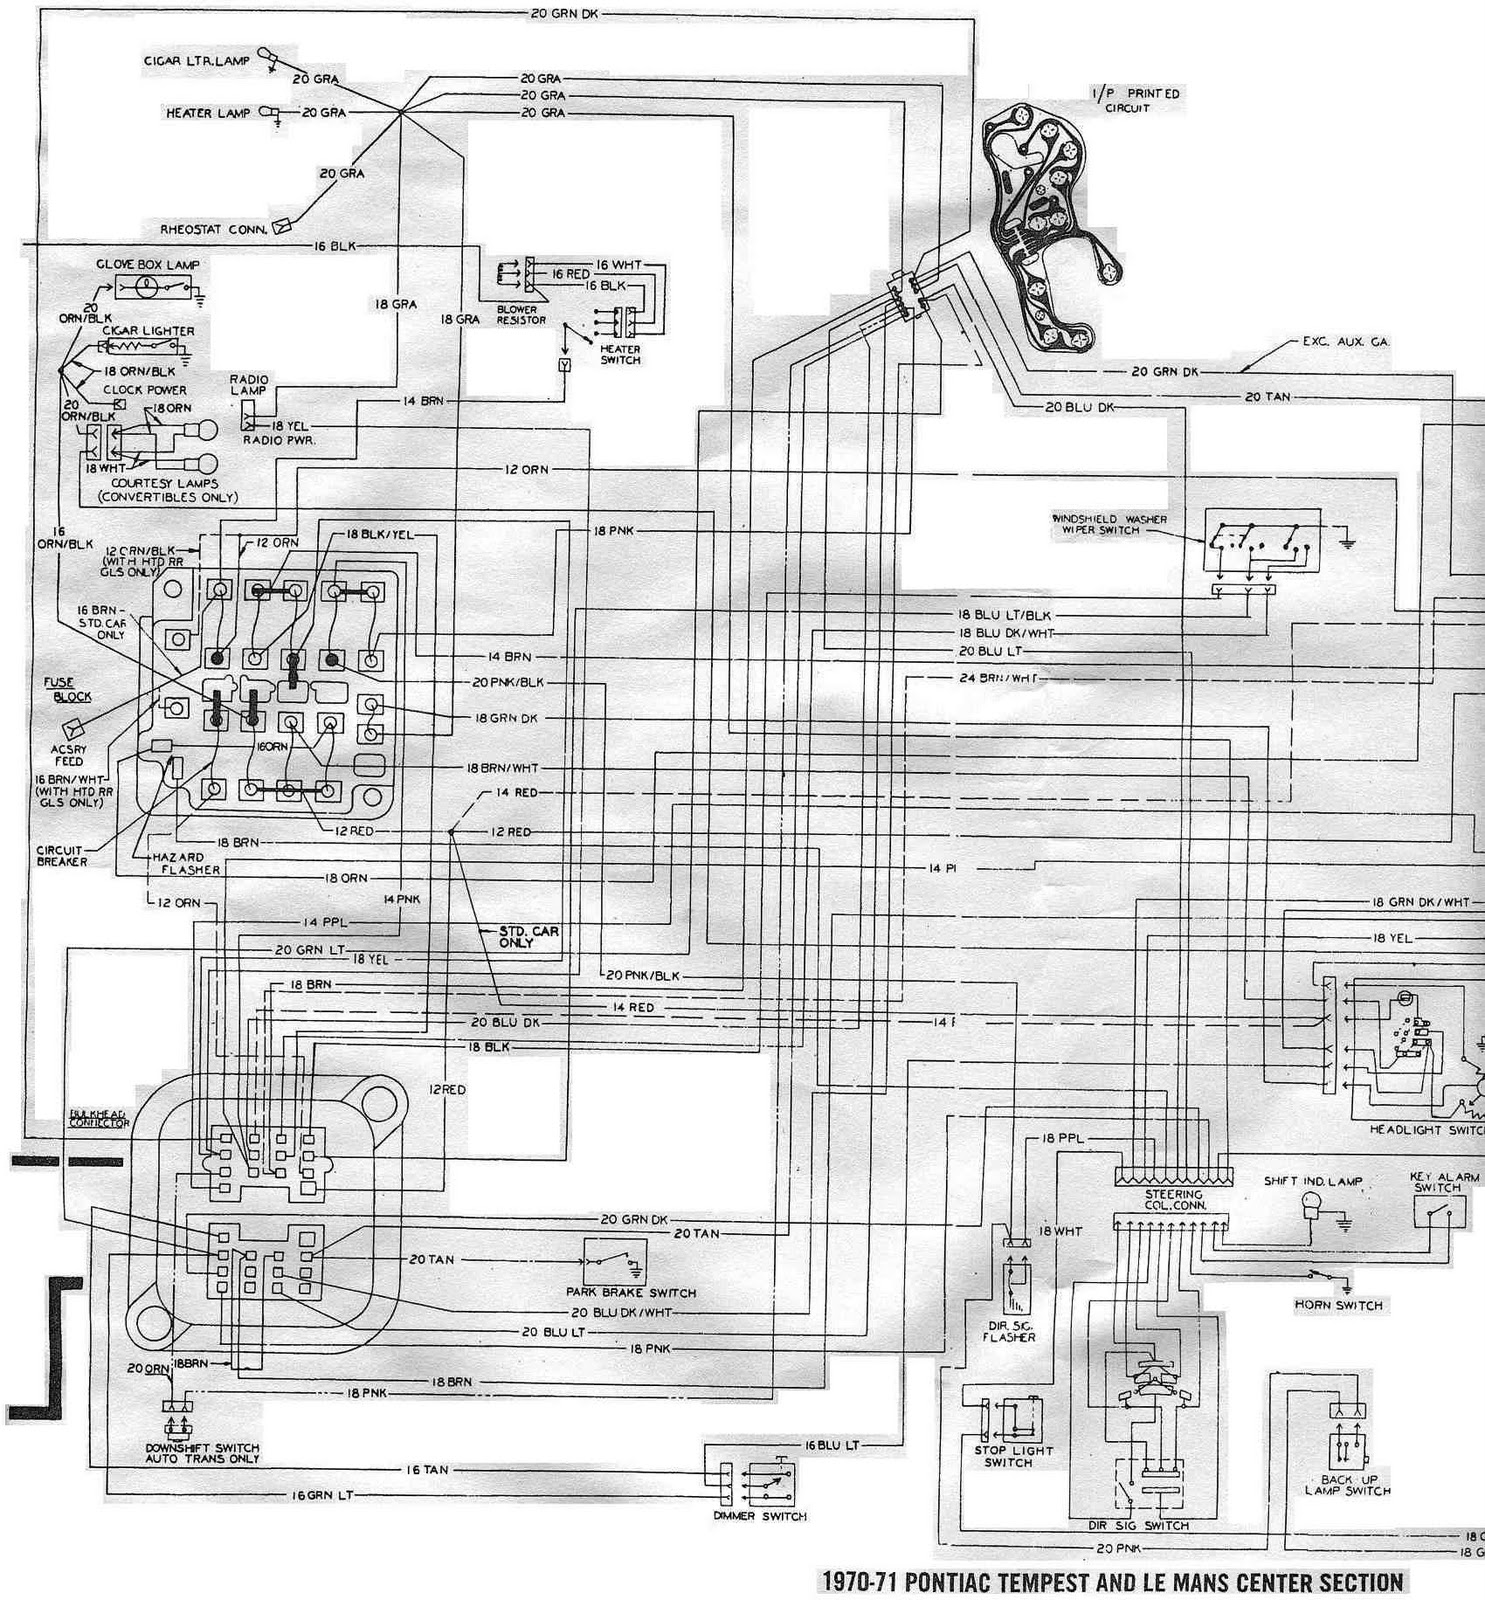 1970 Cuda Wiring Diagram 1967 Gtx Harness Dodge Ram 1500